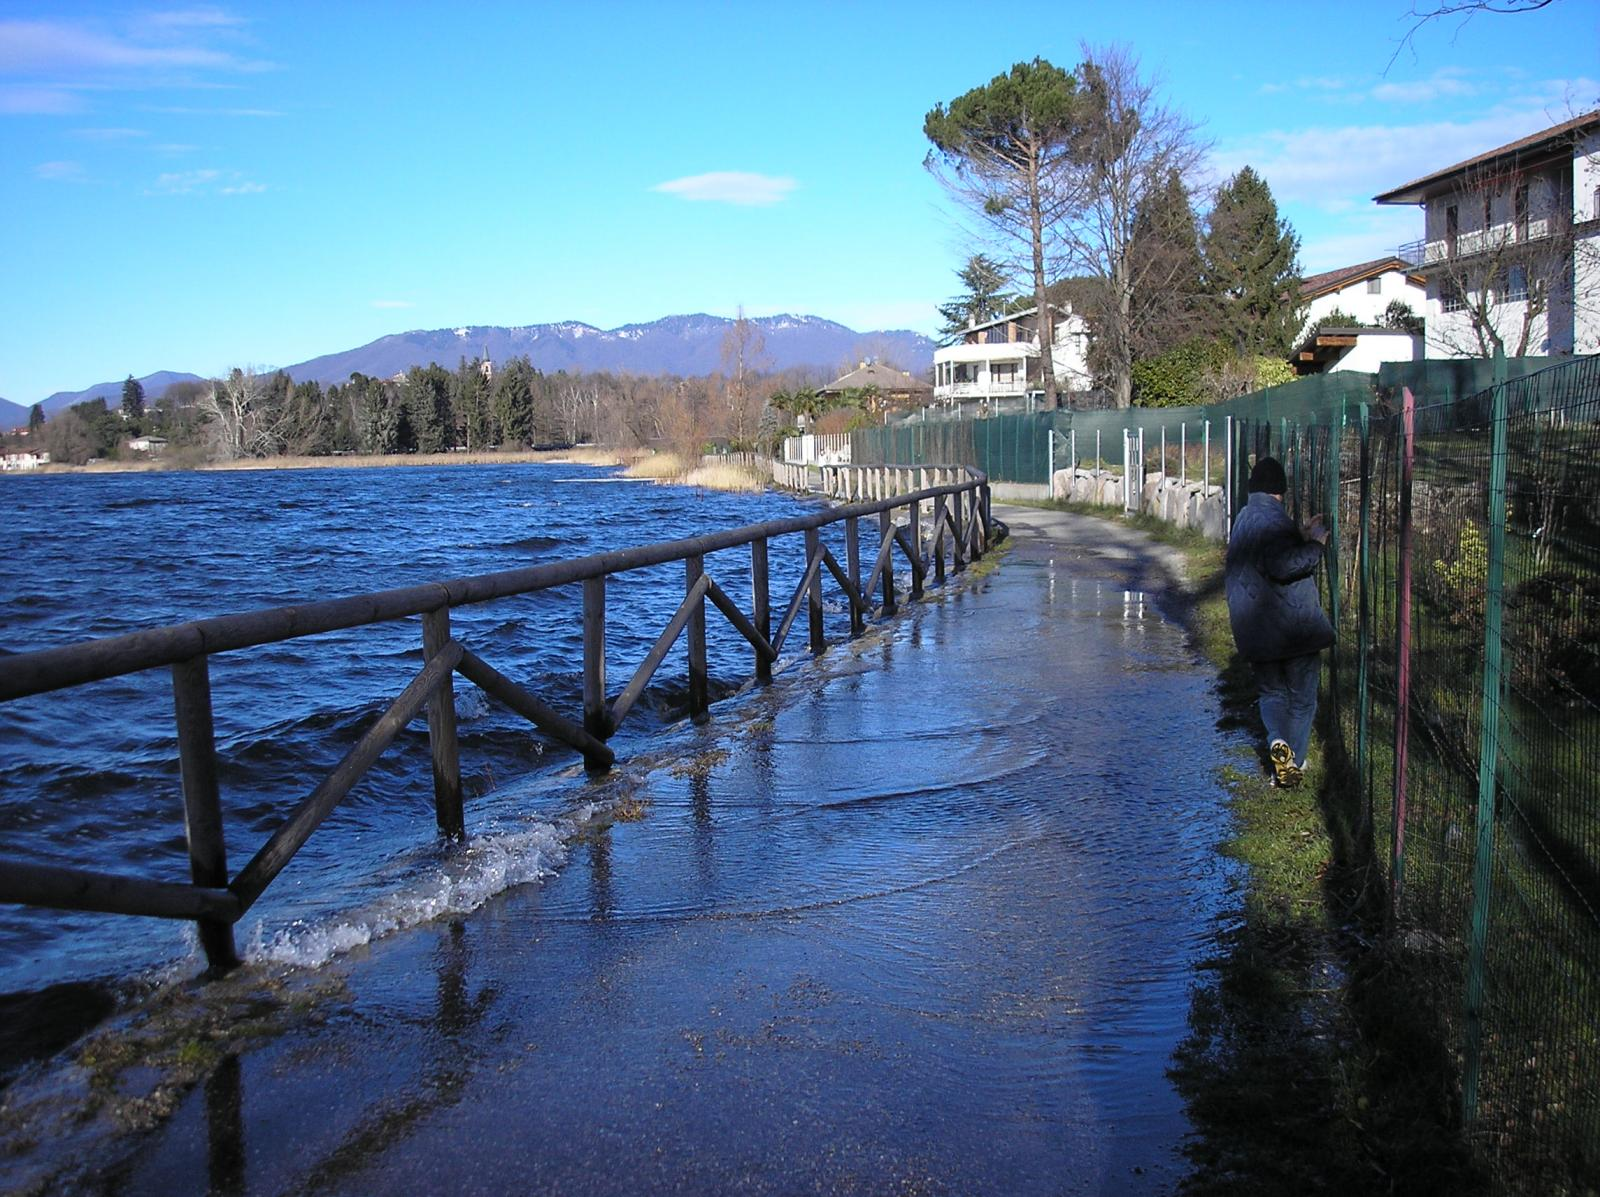 il lago esonda in piu' punti